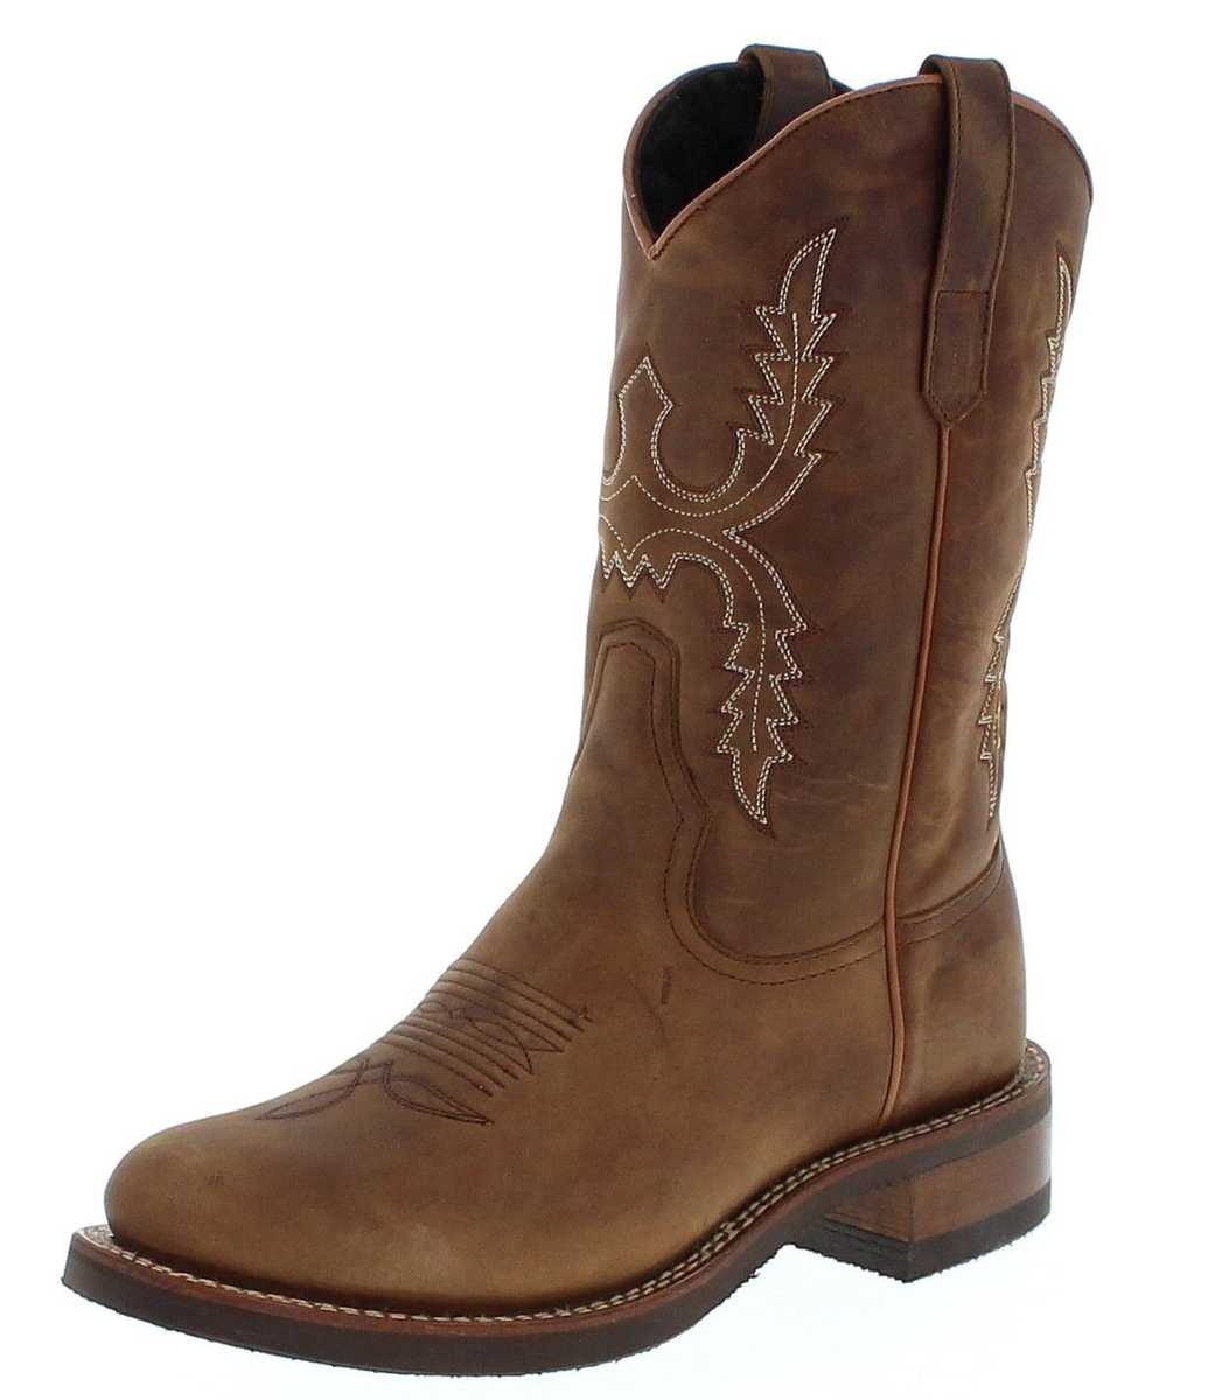 Sendra Boots 11615 Tang Herren Westernreitstiefel mit Merinofell Futter - braun